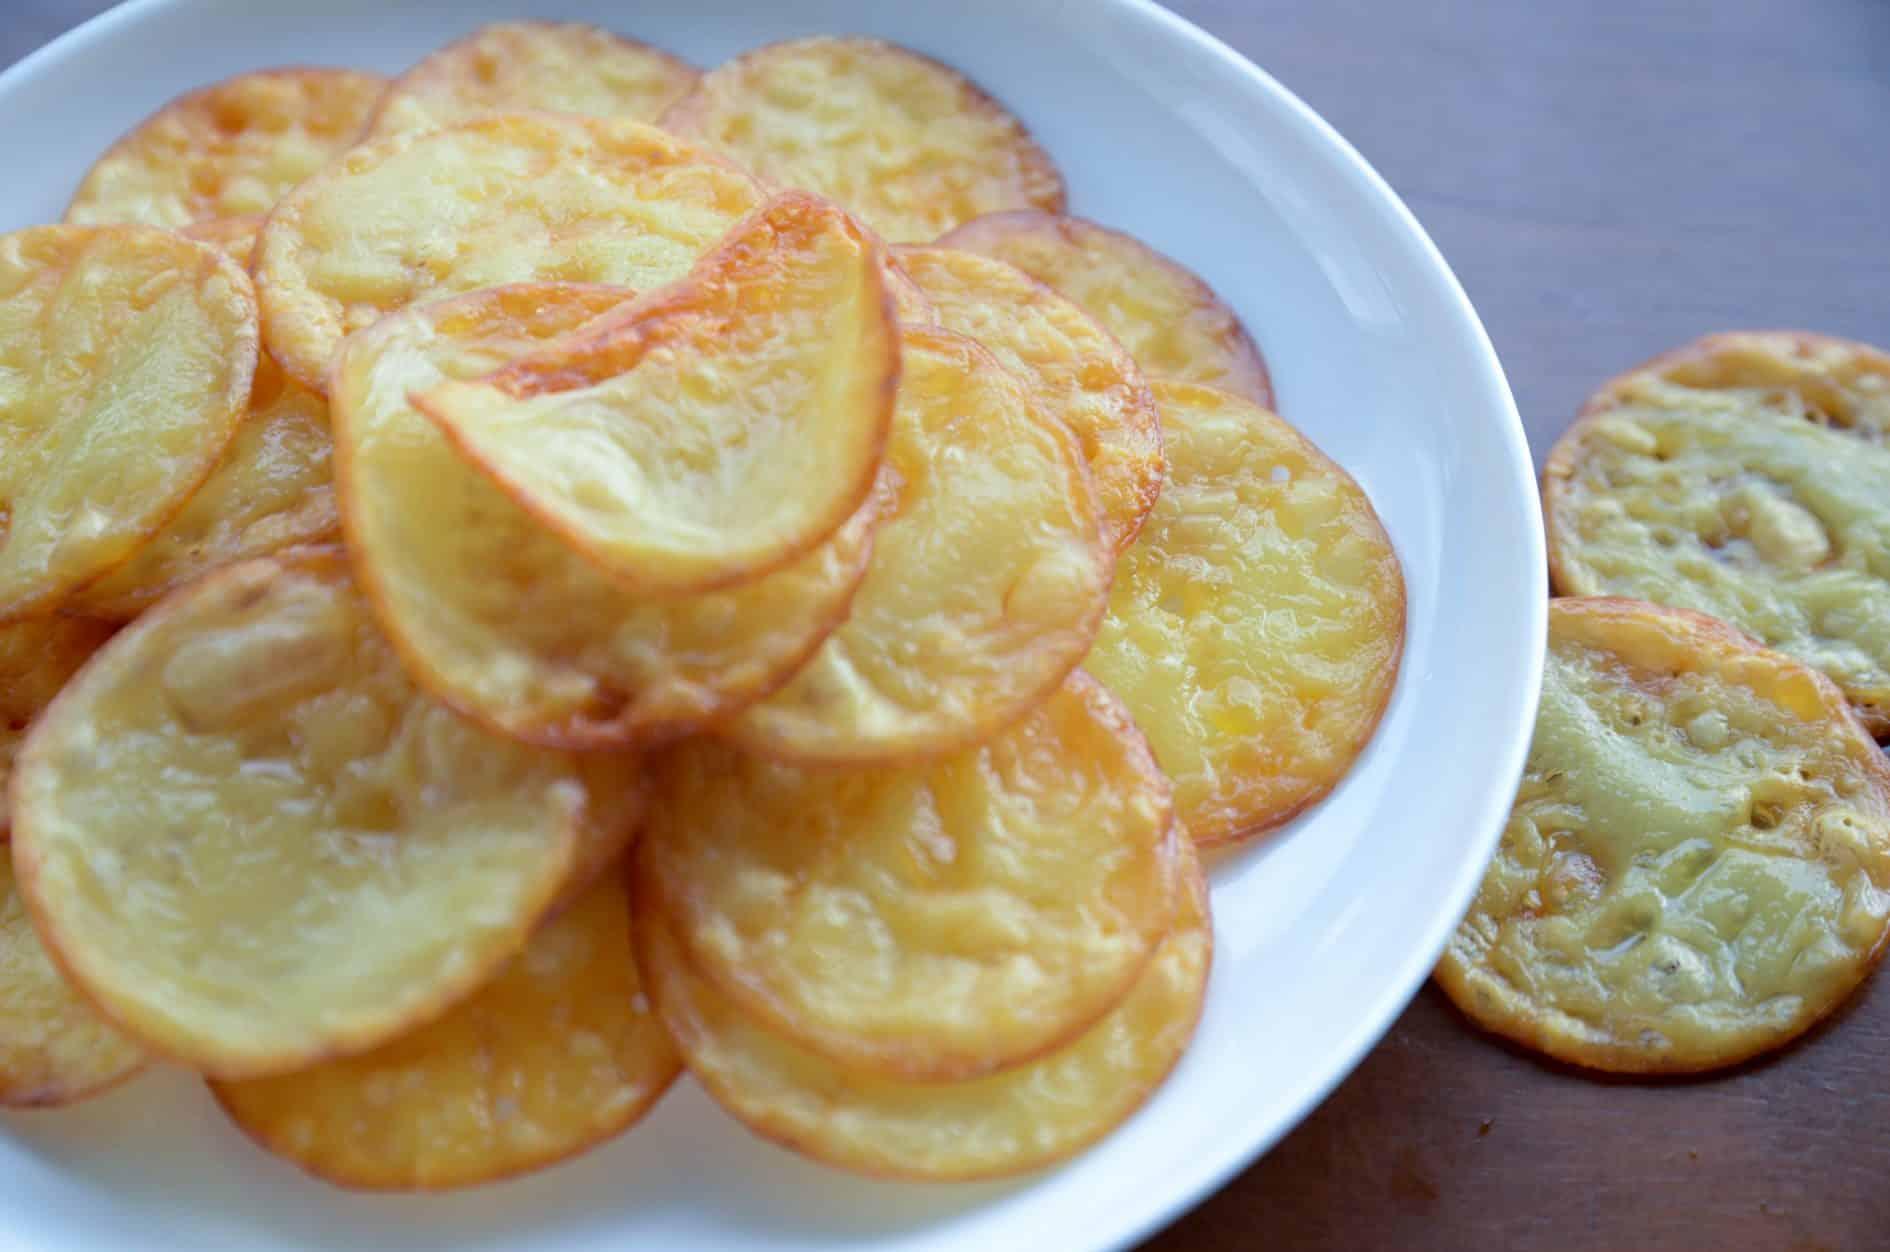 receita de queijo provolone desidratado chips